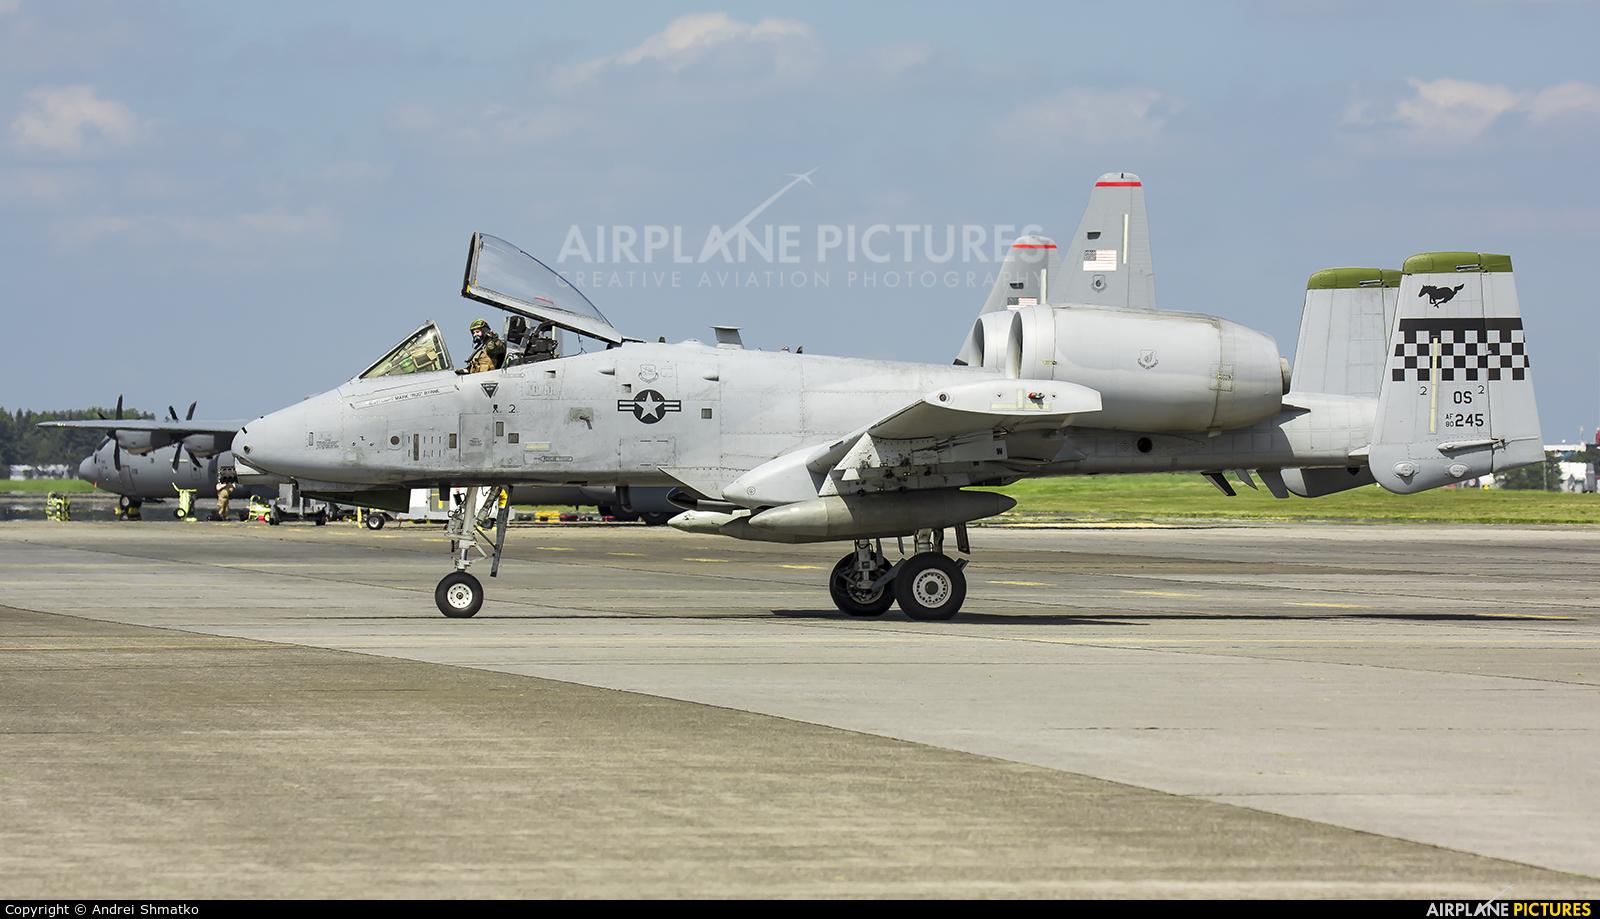 USA - Air Force 80-0245 aircraft at Yokota AB